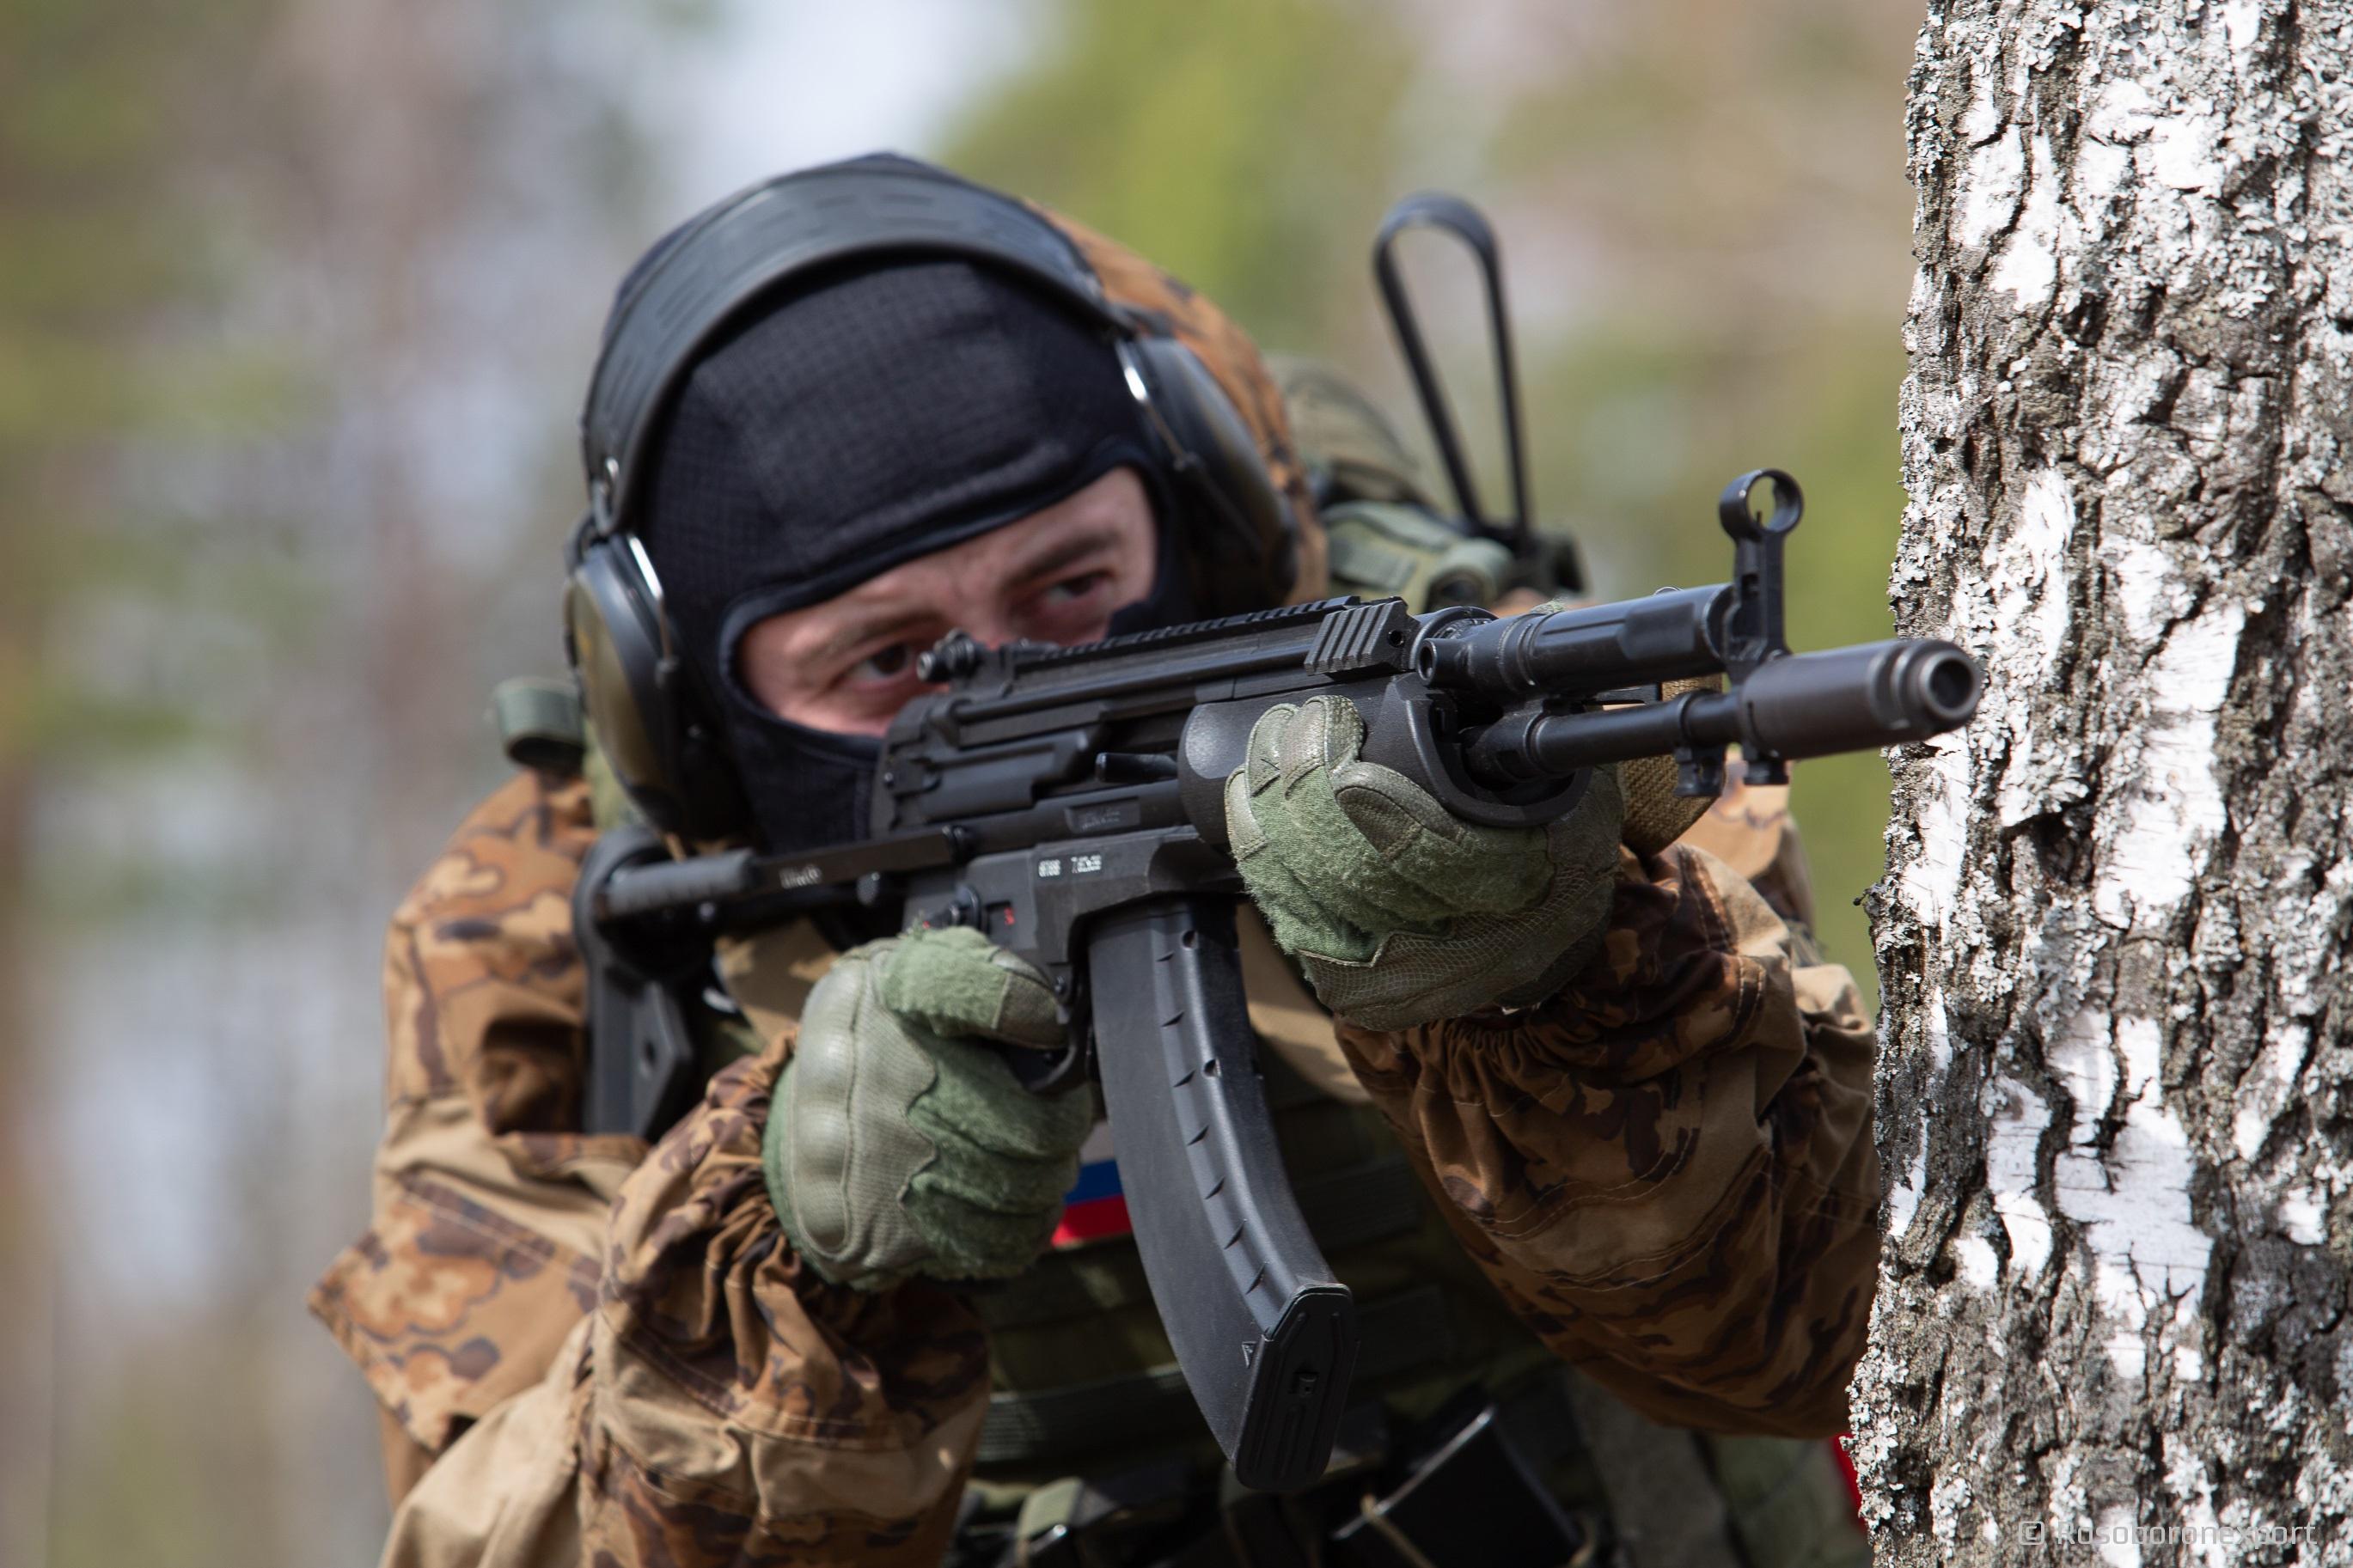 Russian Assault Rifles/Carbines/Machine Guns Thread: #2 - Page 10 B0bad8427c2e2c25bb72af57e792f320